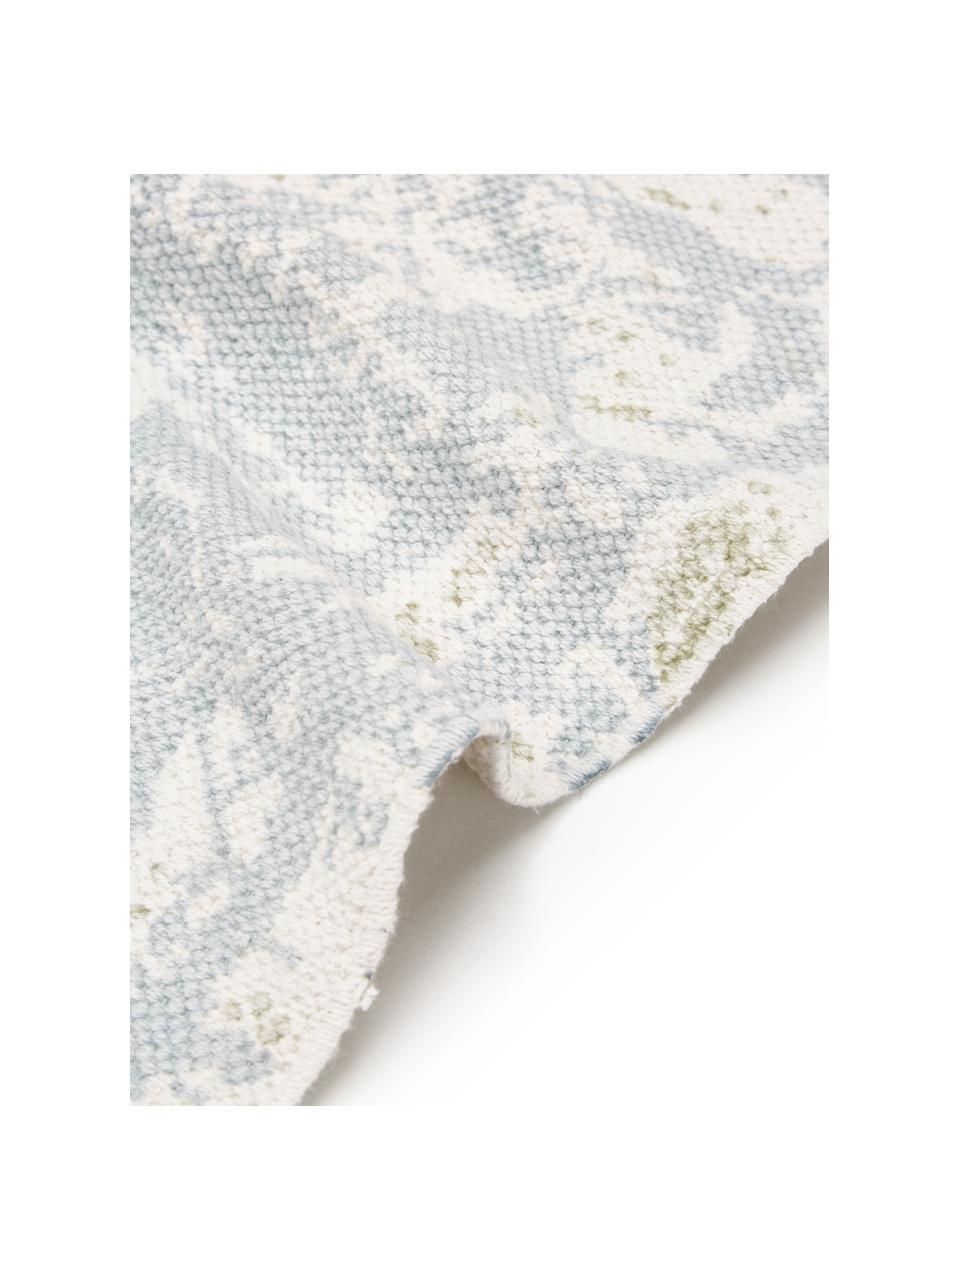 Tappeto vintage in cotone beige/blu tessuto a mano Jasmine, Beige, blu, Larg. 50 x Lung. 80 cm (taglia XXS)